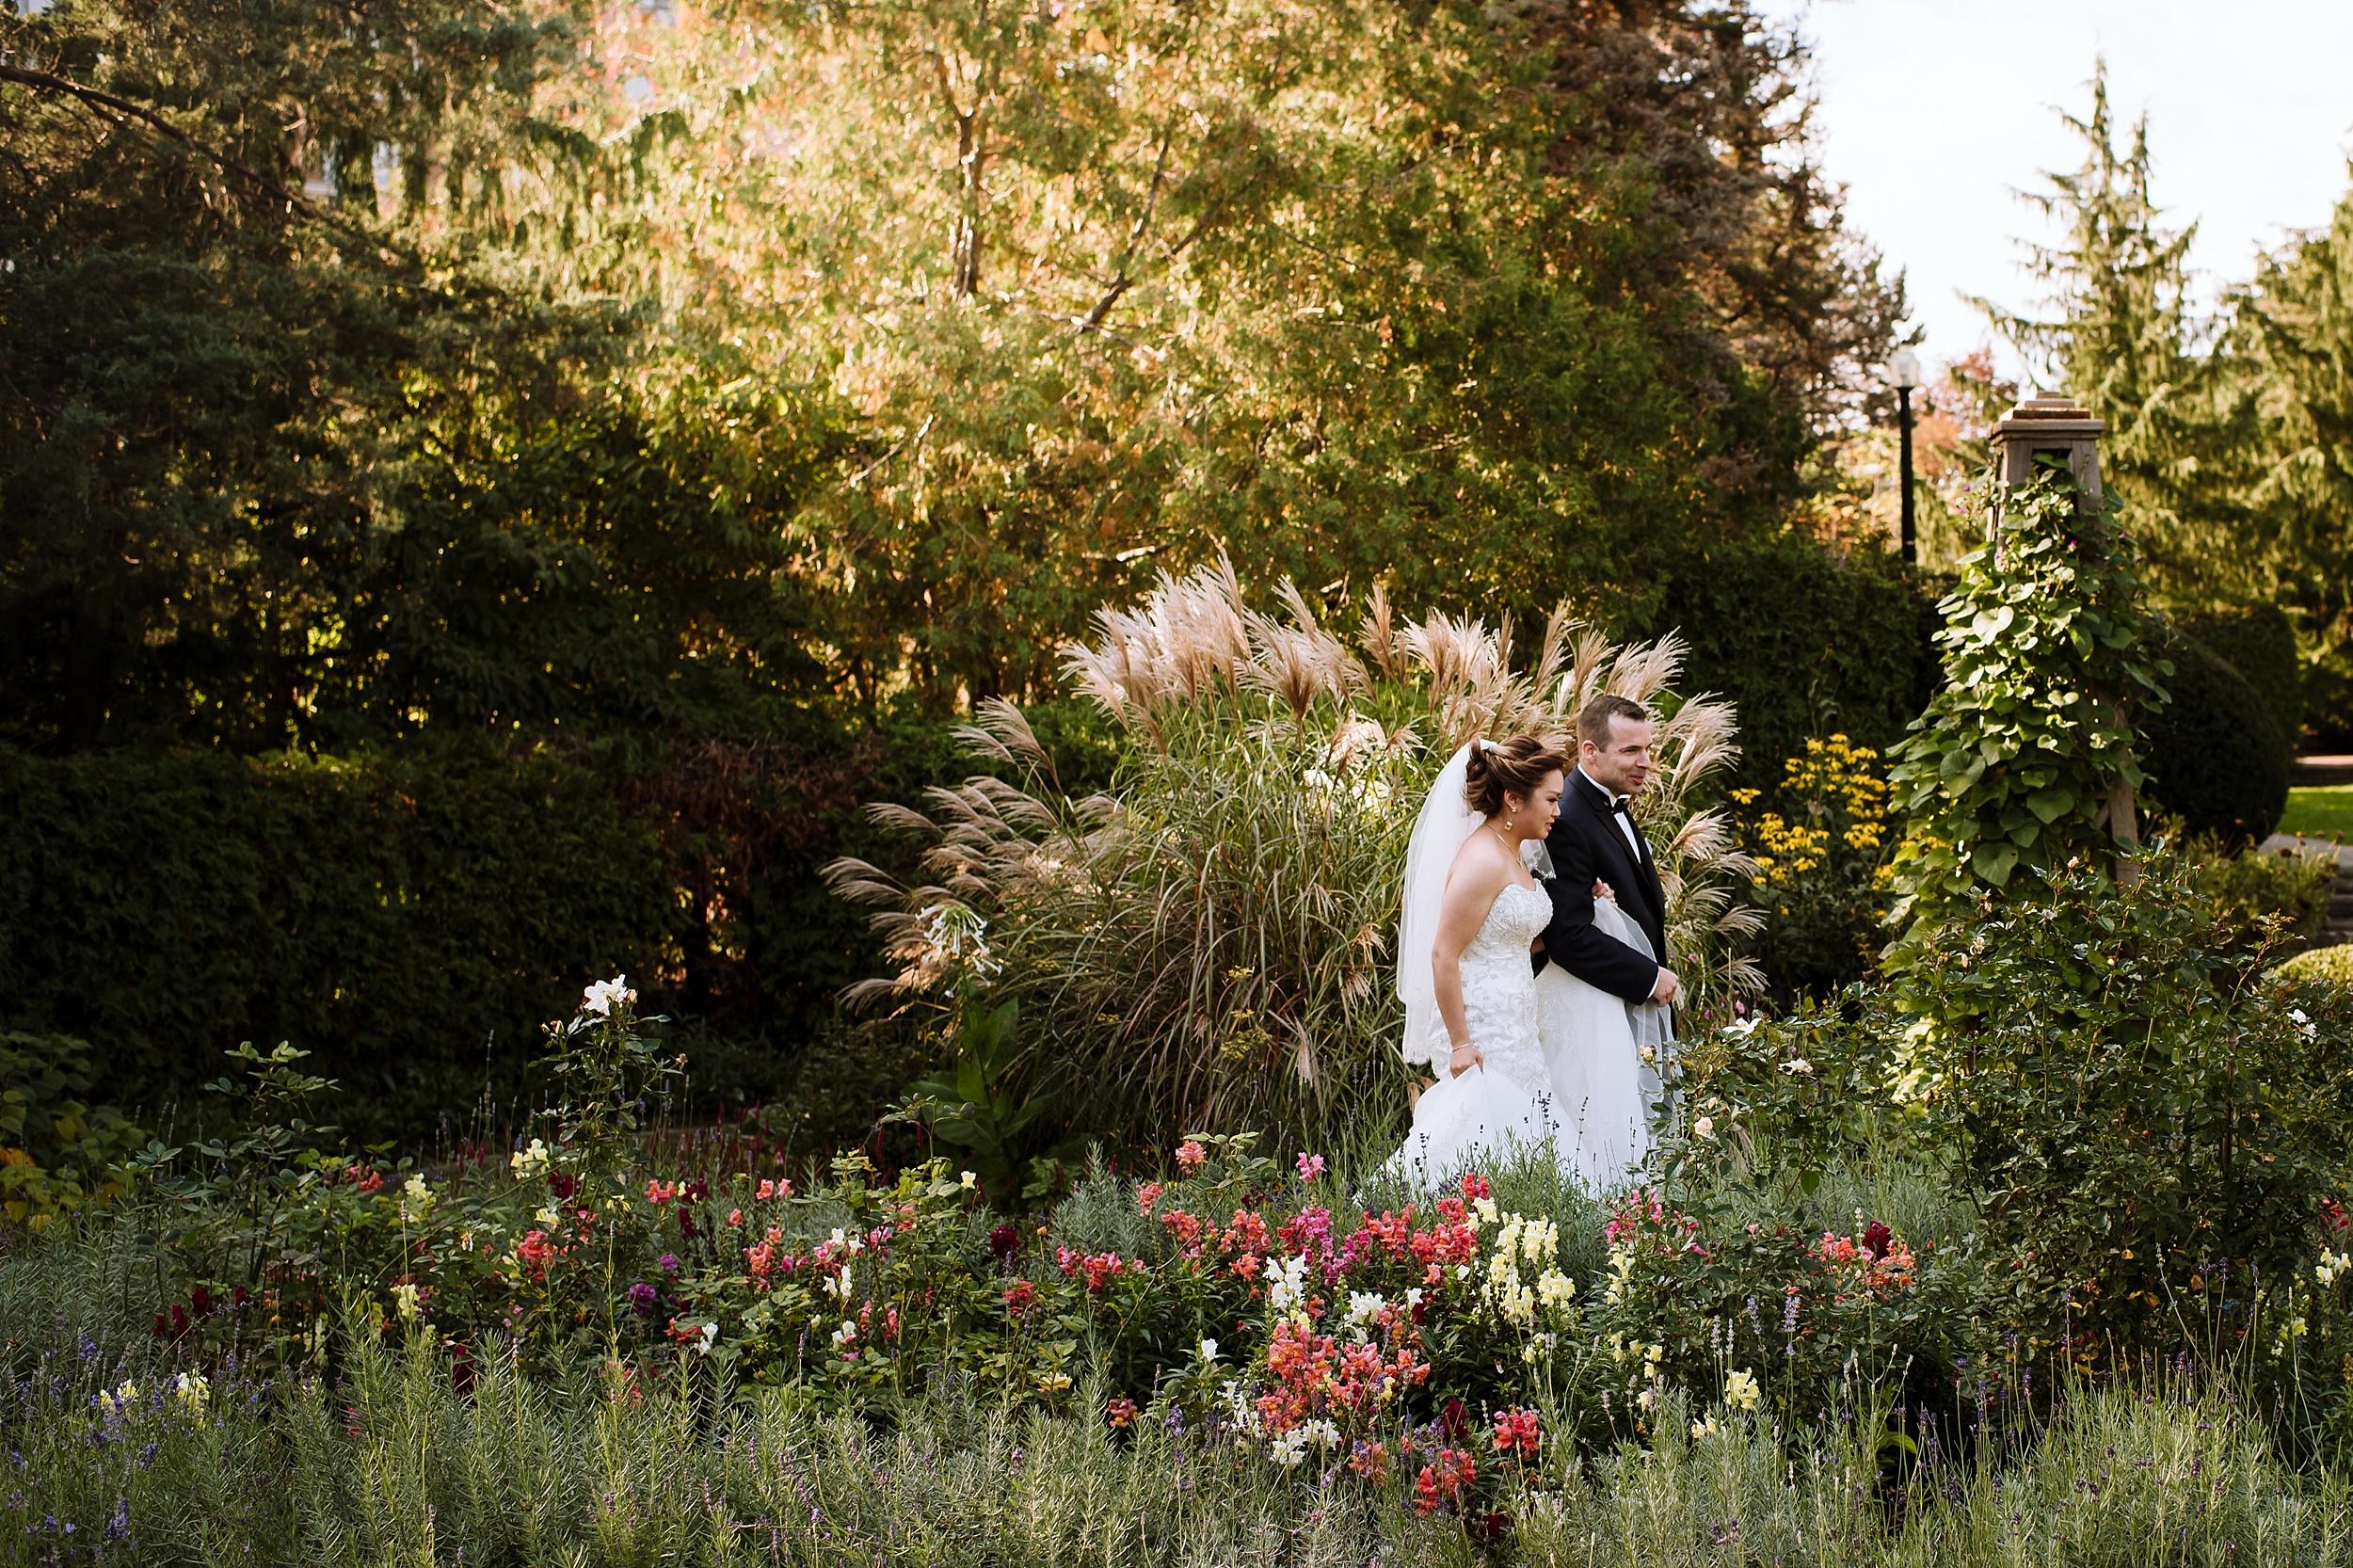 Sunnybrook_Estates_Alexander_Muir_Toronto_Wedding_Photographer_0005.jpg